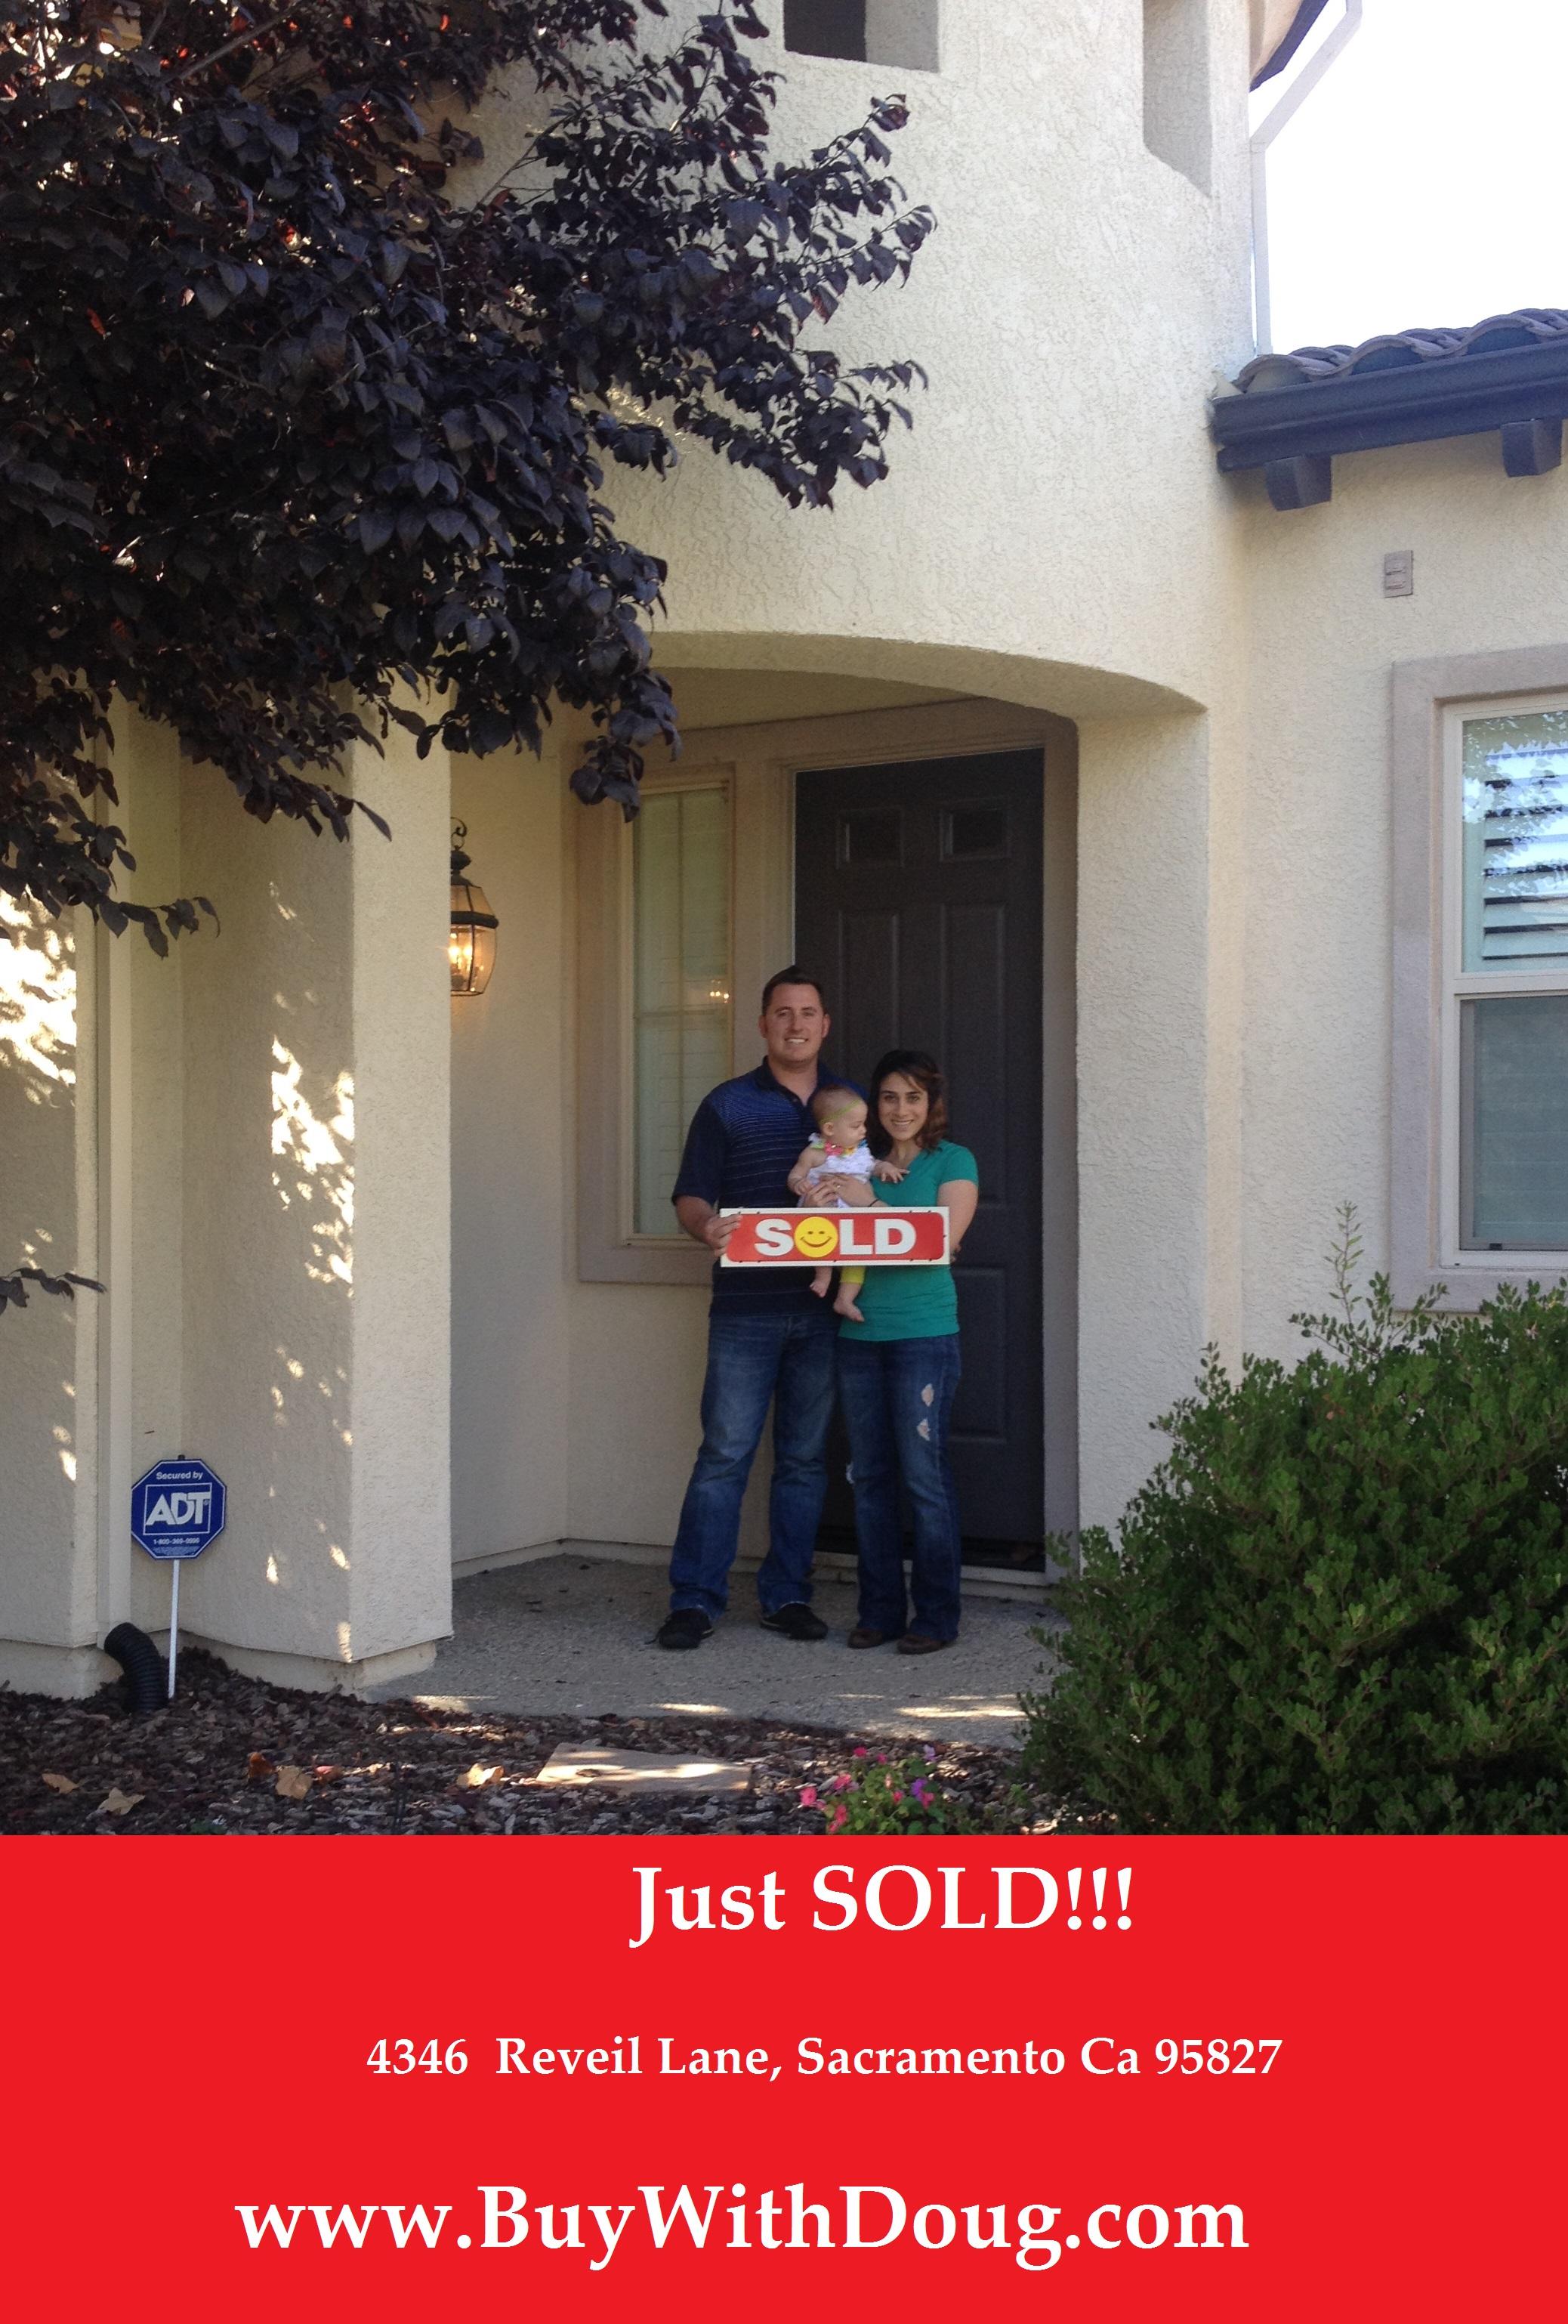 Just Sold - 4346 Reveil Lane, Sacramento Ca 95827 - www.BuyWithDoug.com - Doug Reynolds Real Estate in Sacramento